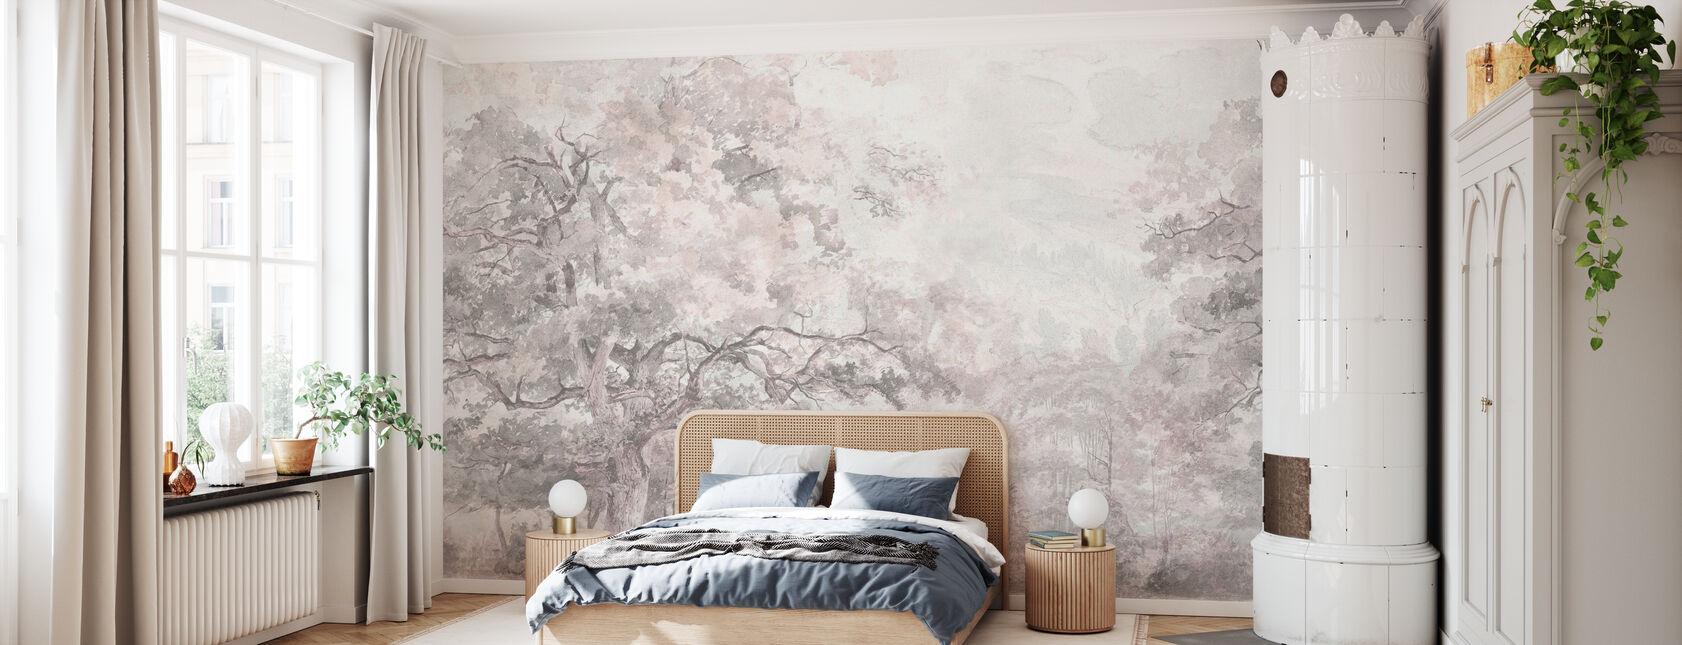 Belleza en todas partes - Rosa - Papel pintado - Dormitorio